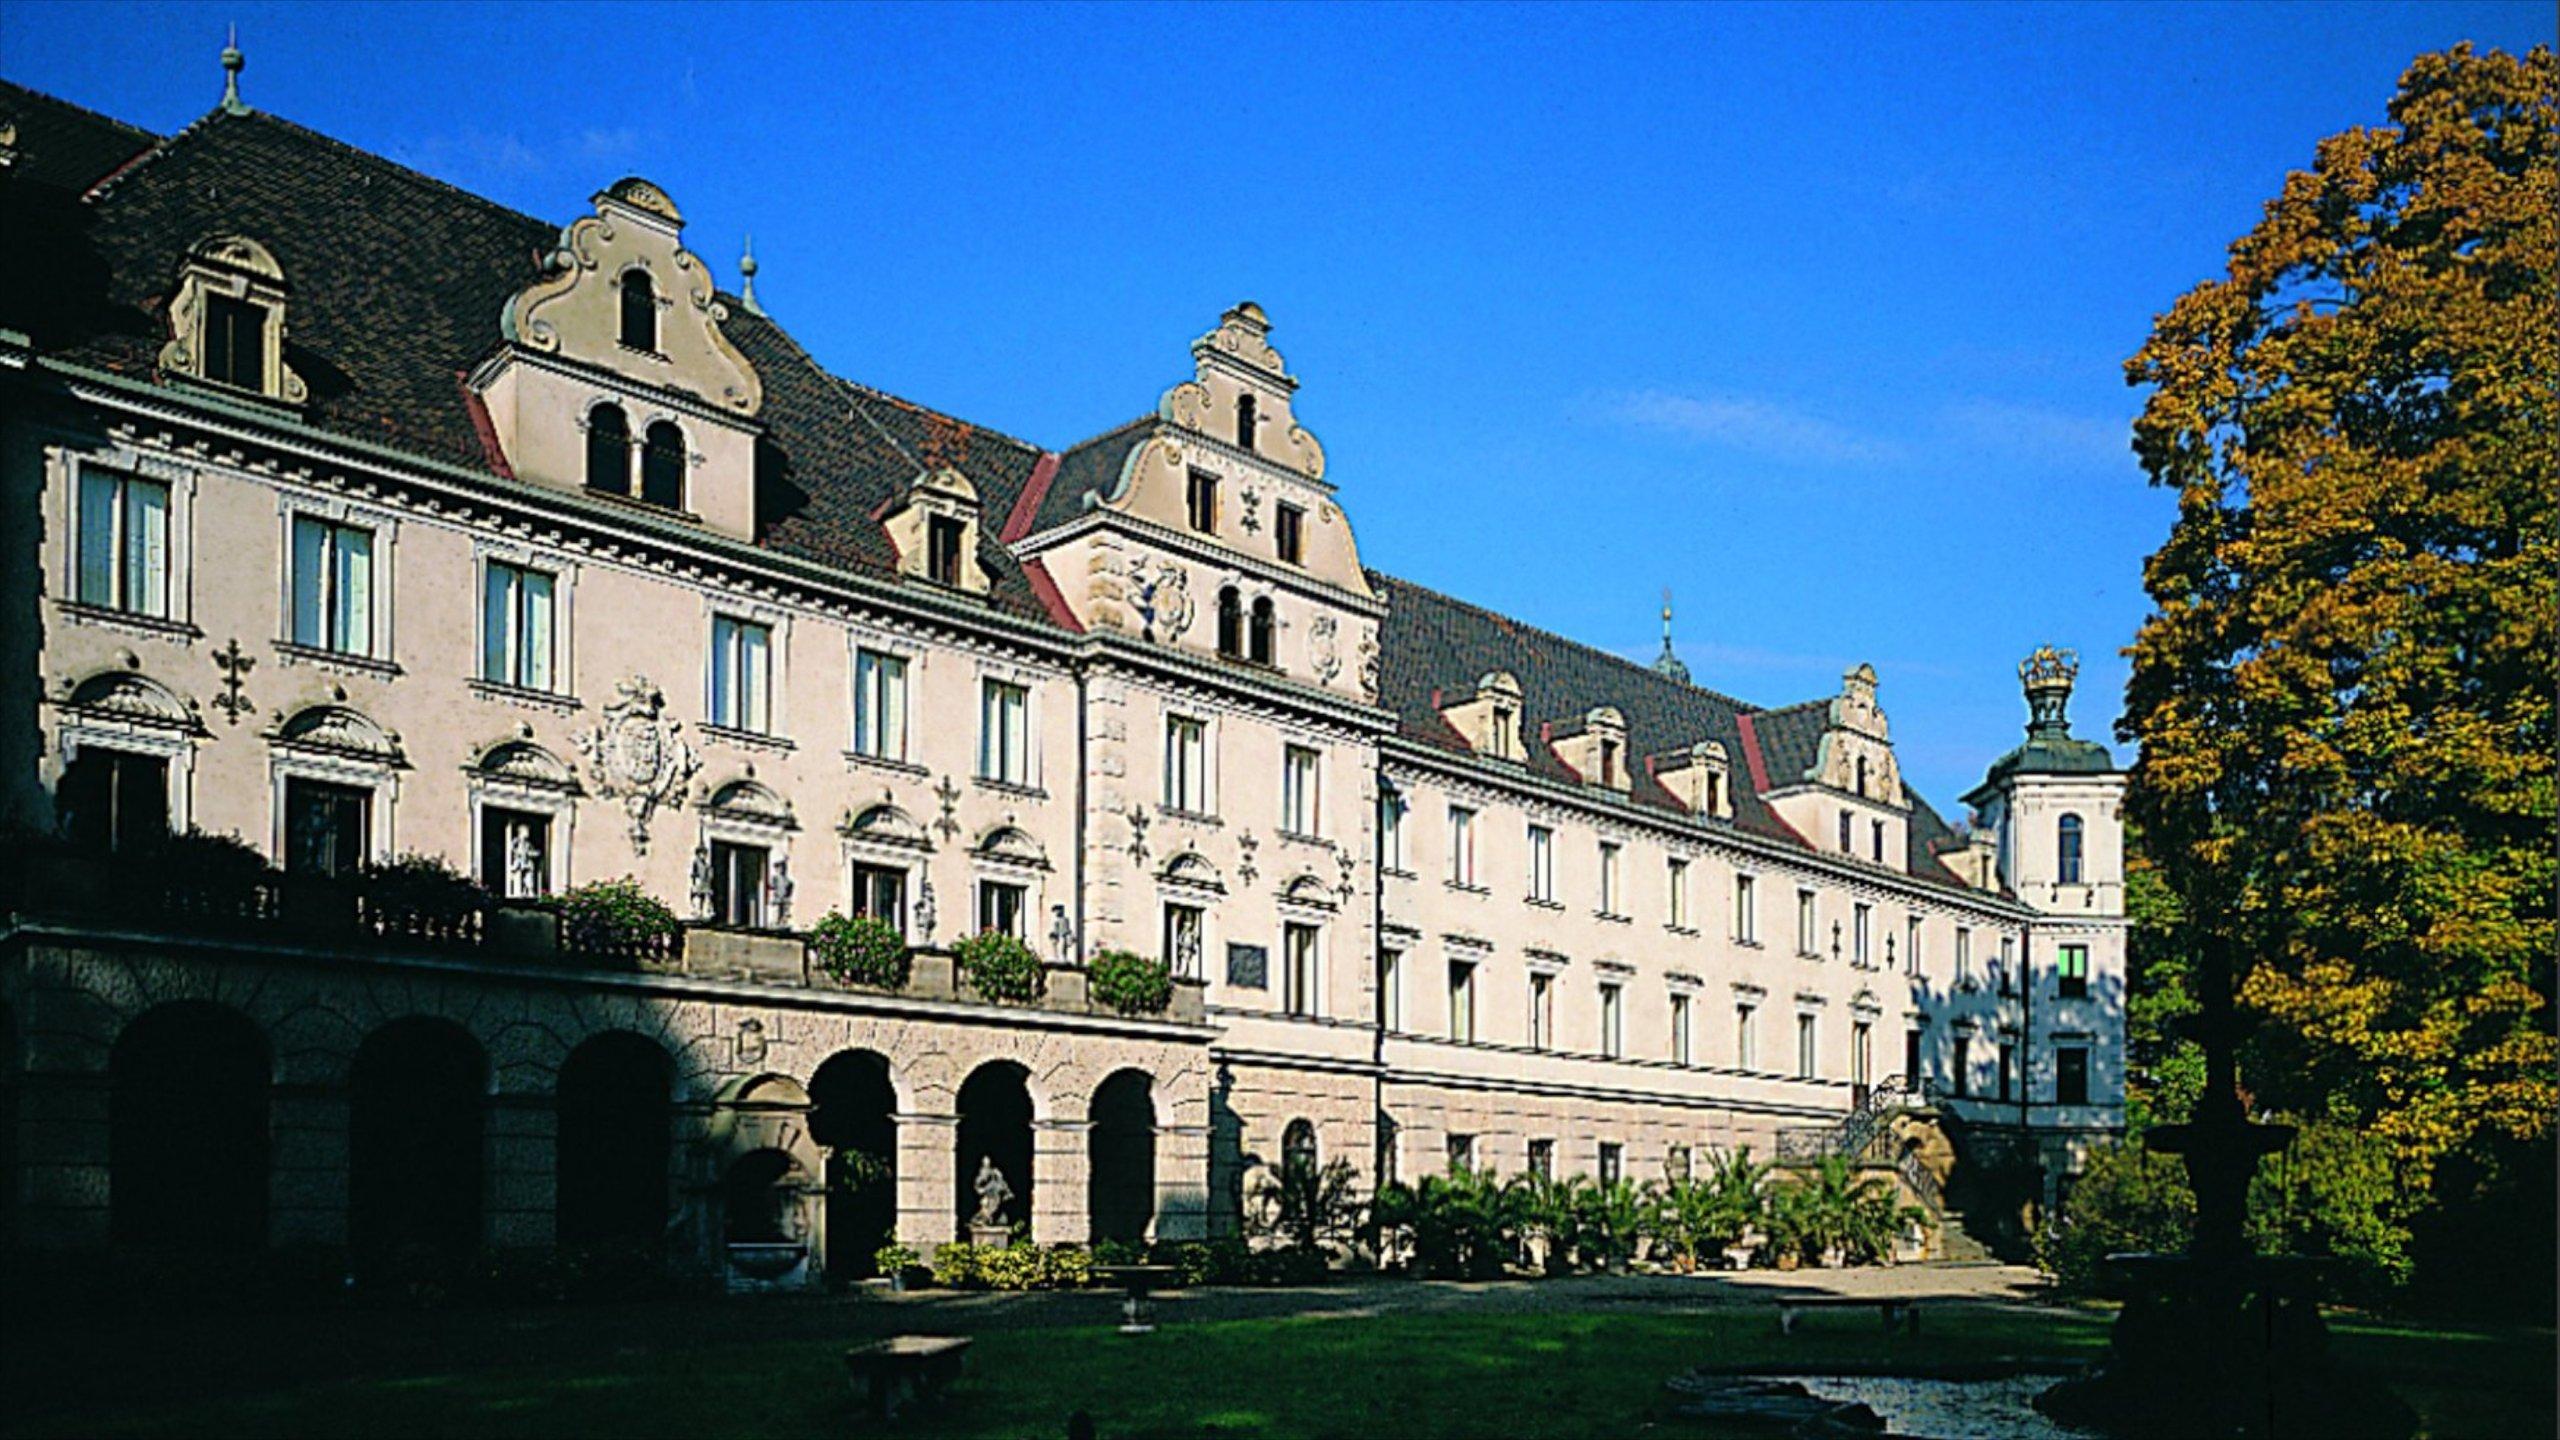 Upper Palatinate, Bavaria, Germany